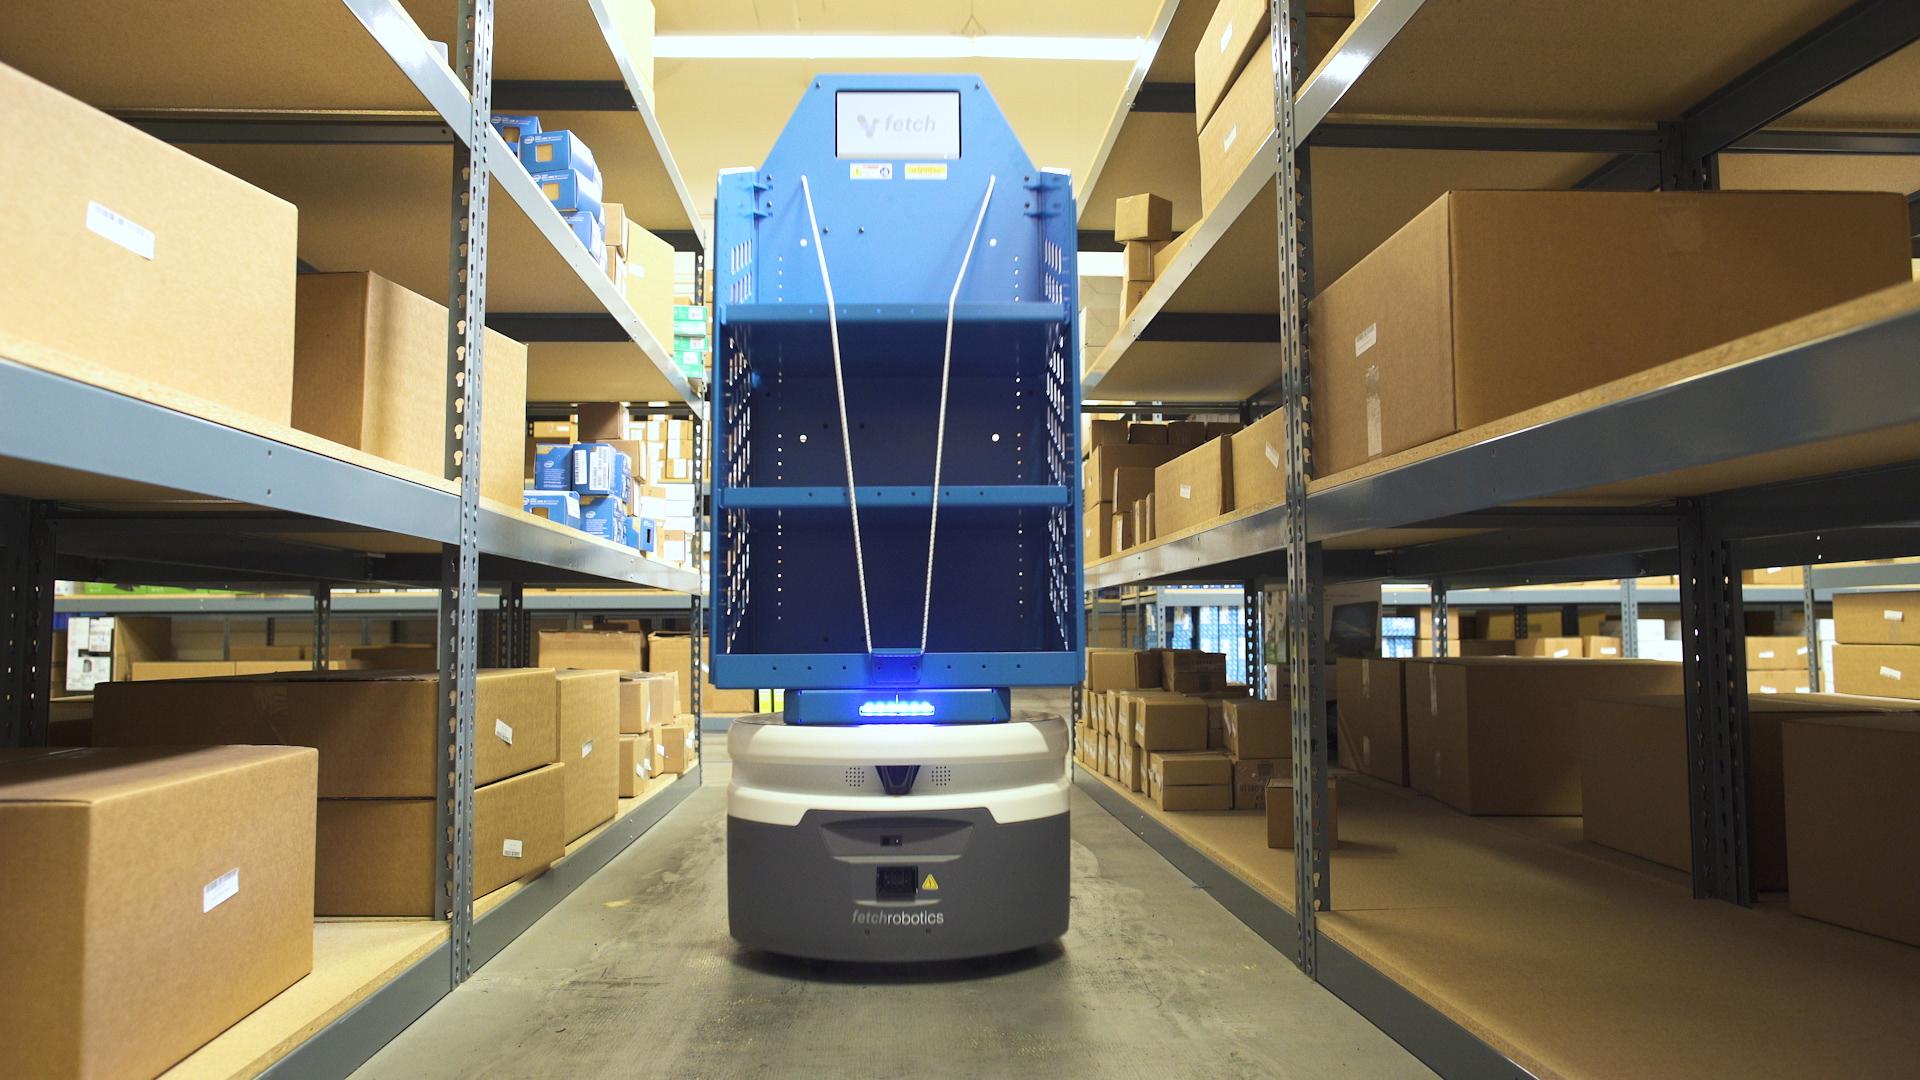 Amazon's Robot War Is Spreading - Bloomberg